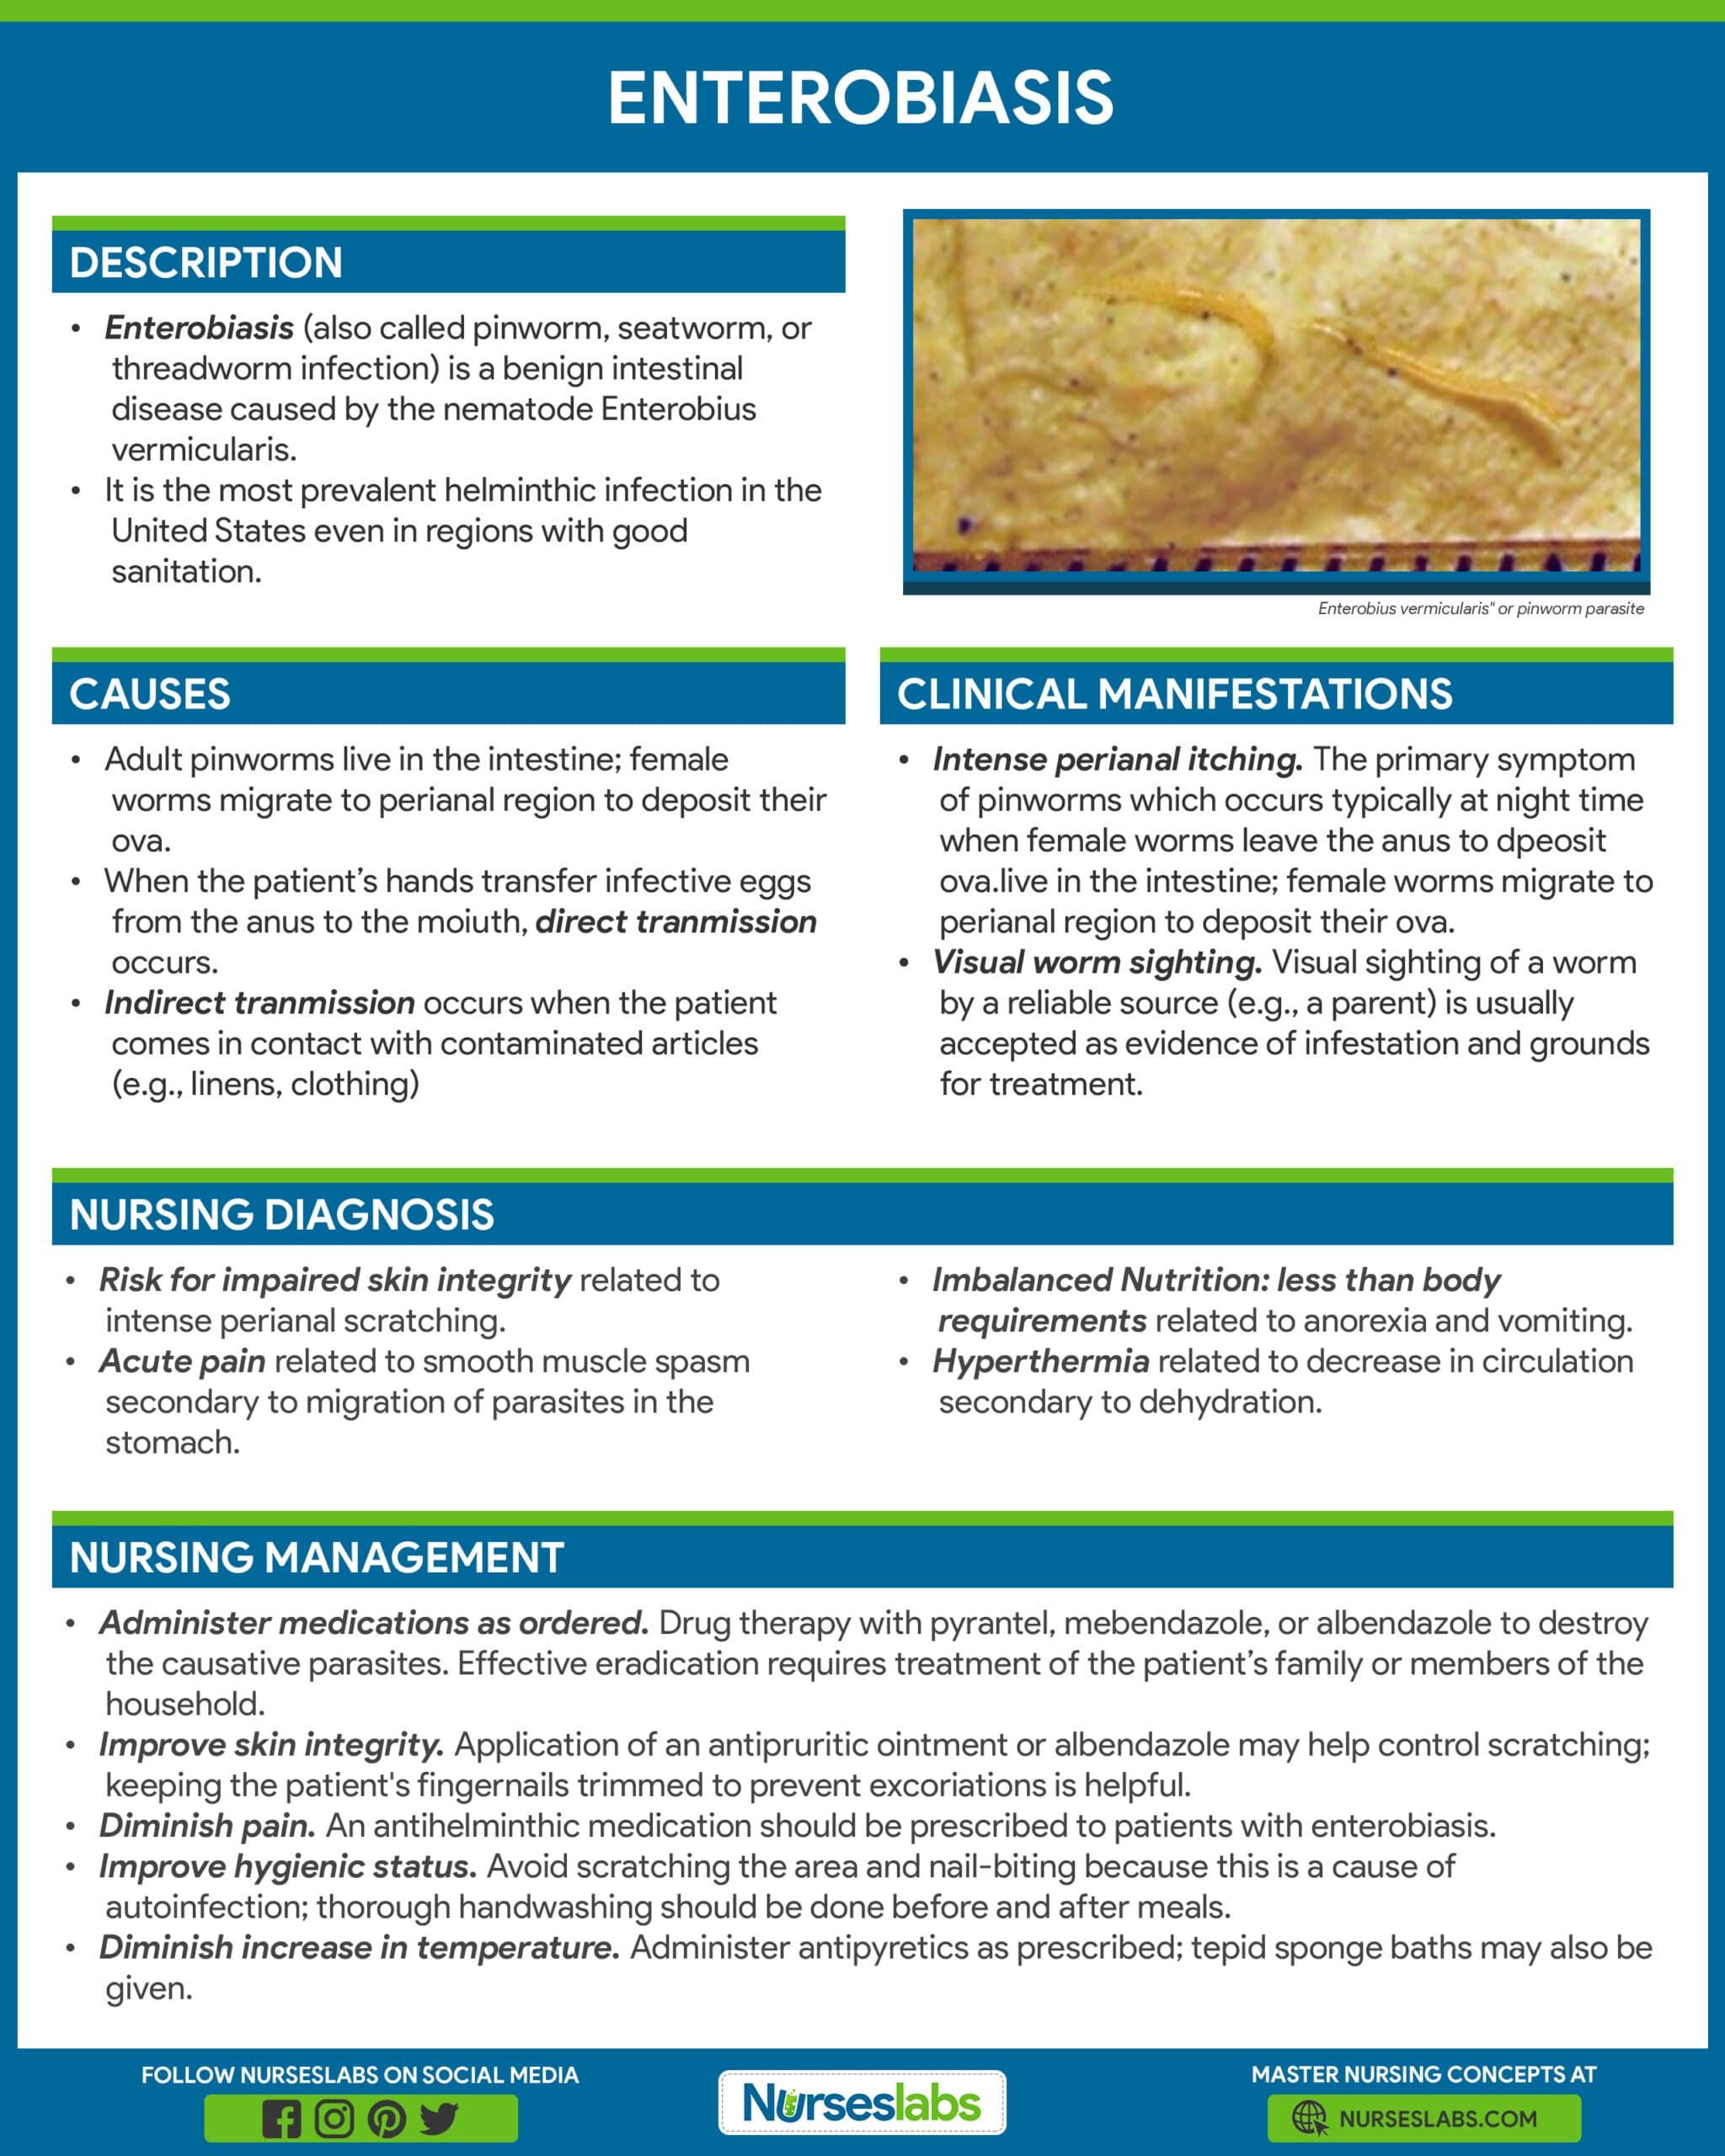 causes of enterobiasis